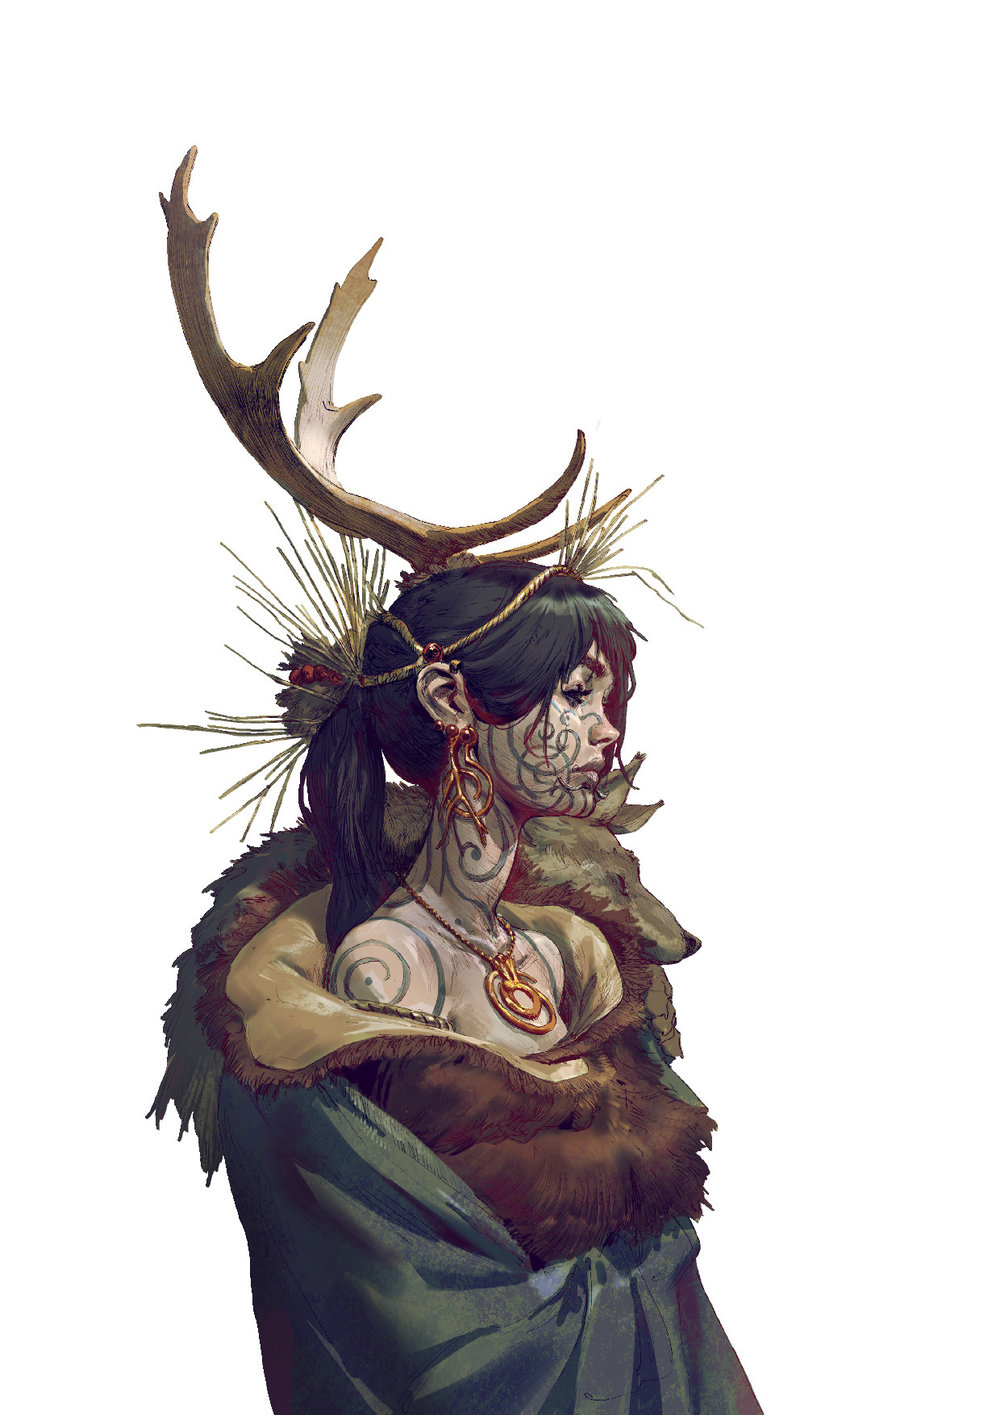 even-amundsen-6cf5db99-7793-4fef-a399-6075e7511278.jpg